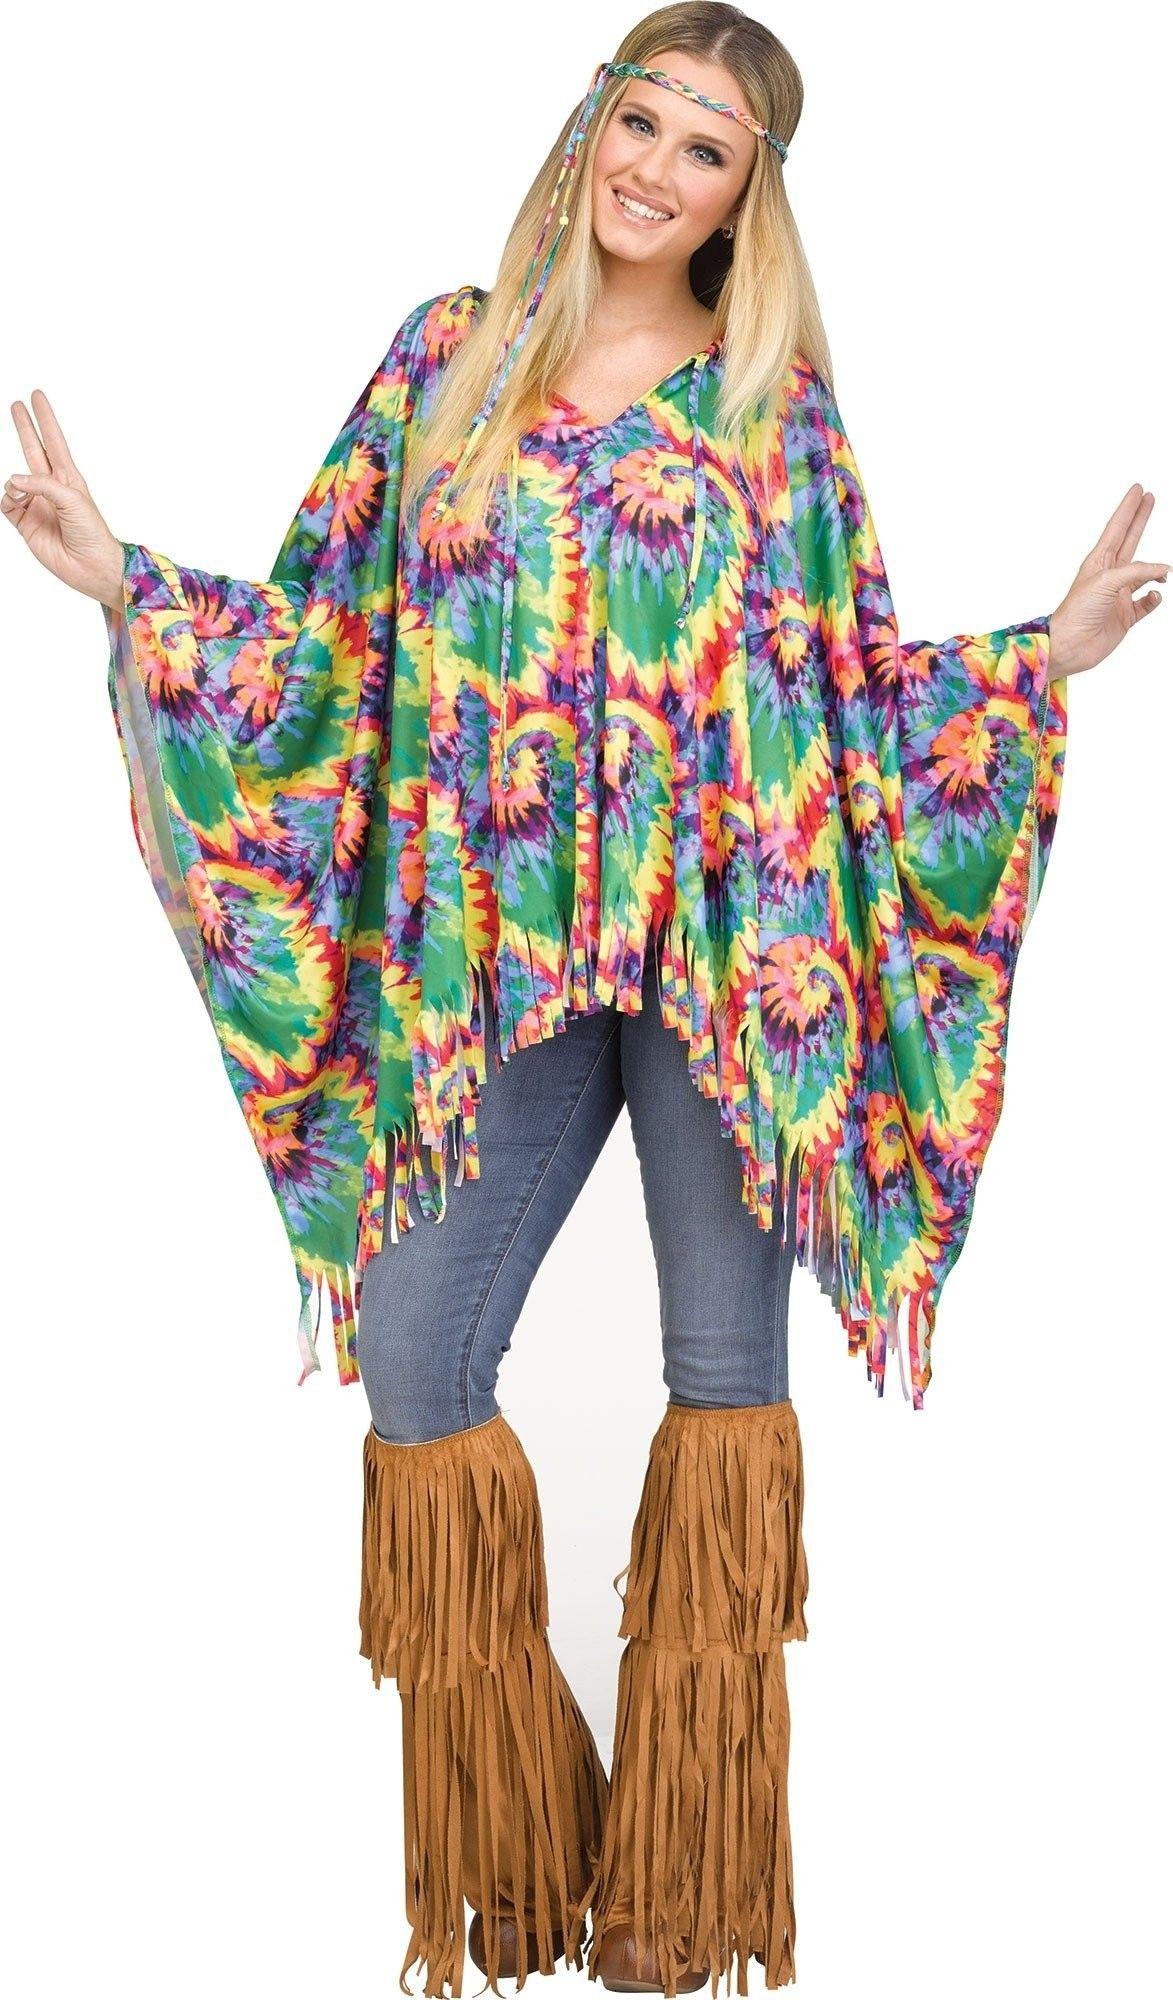 FLOWER POWER Costume Hippie Donna Costume M 38-40 70er anni OUTFIT schlagermove